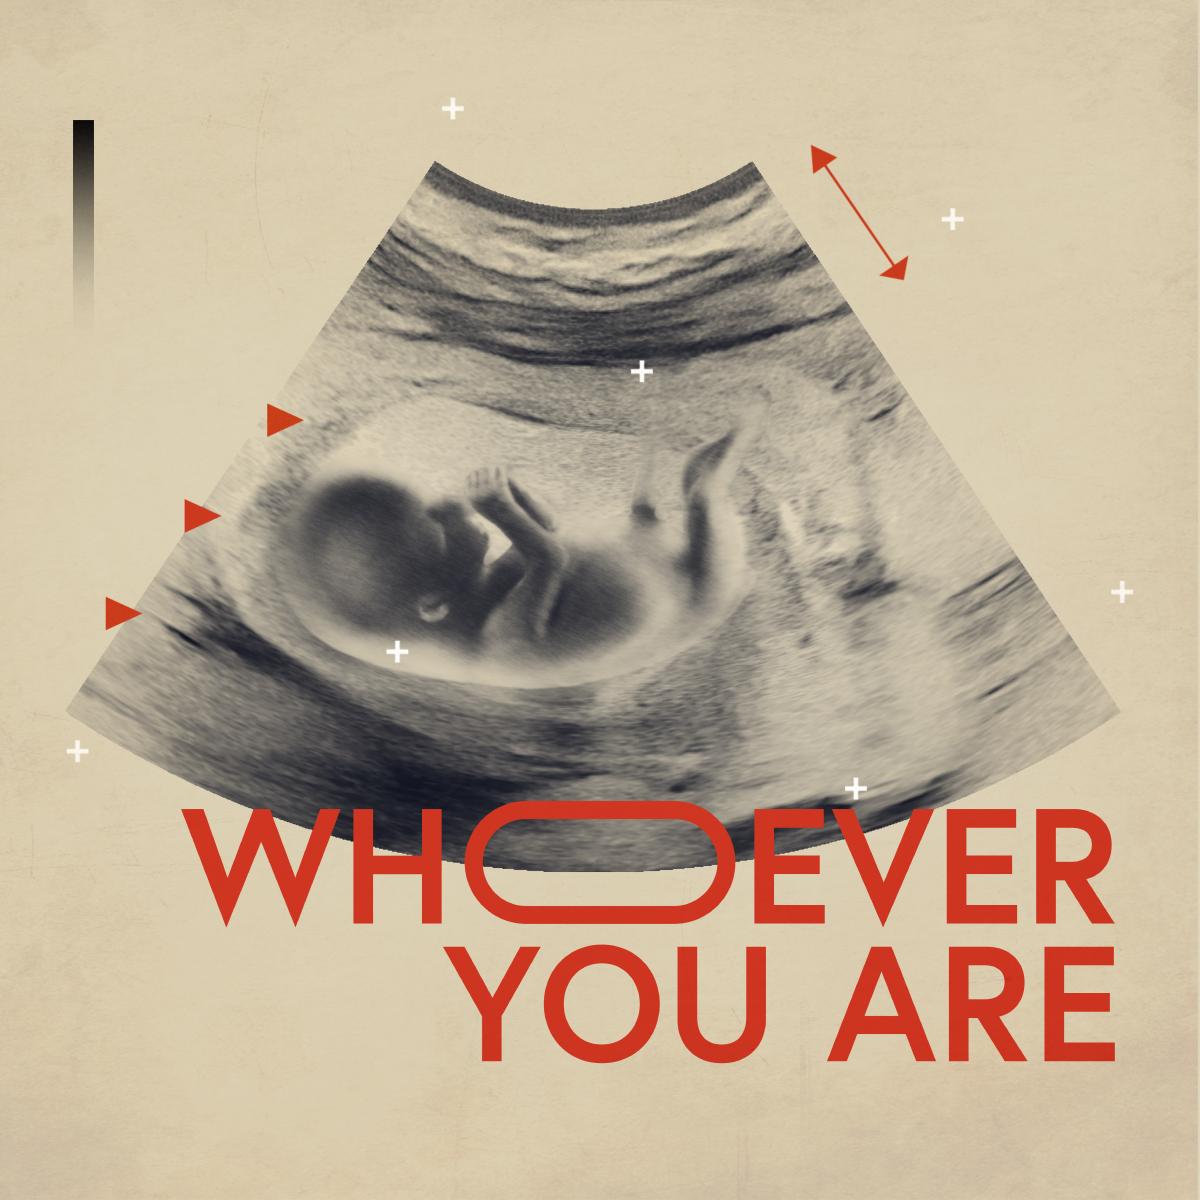 kalaska-whoever-you-are-album-review